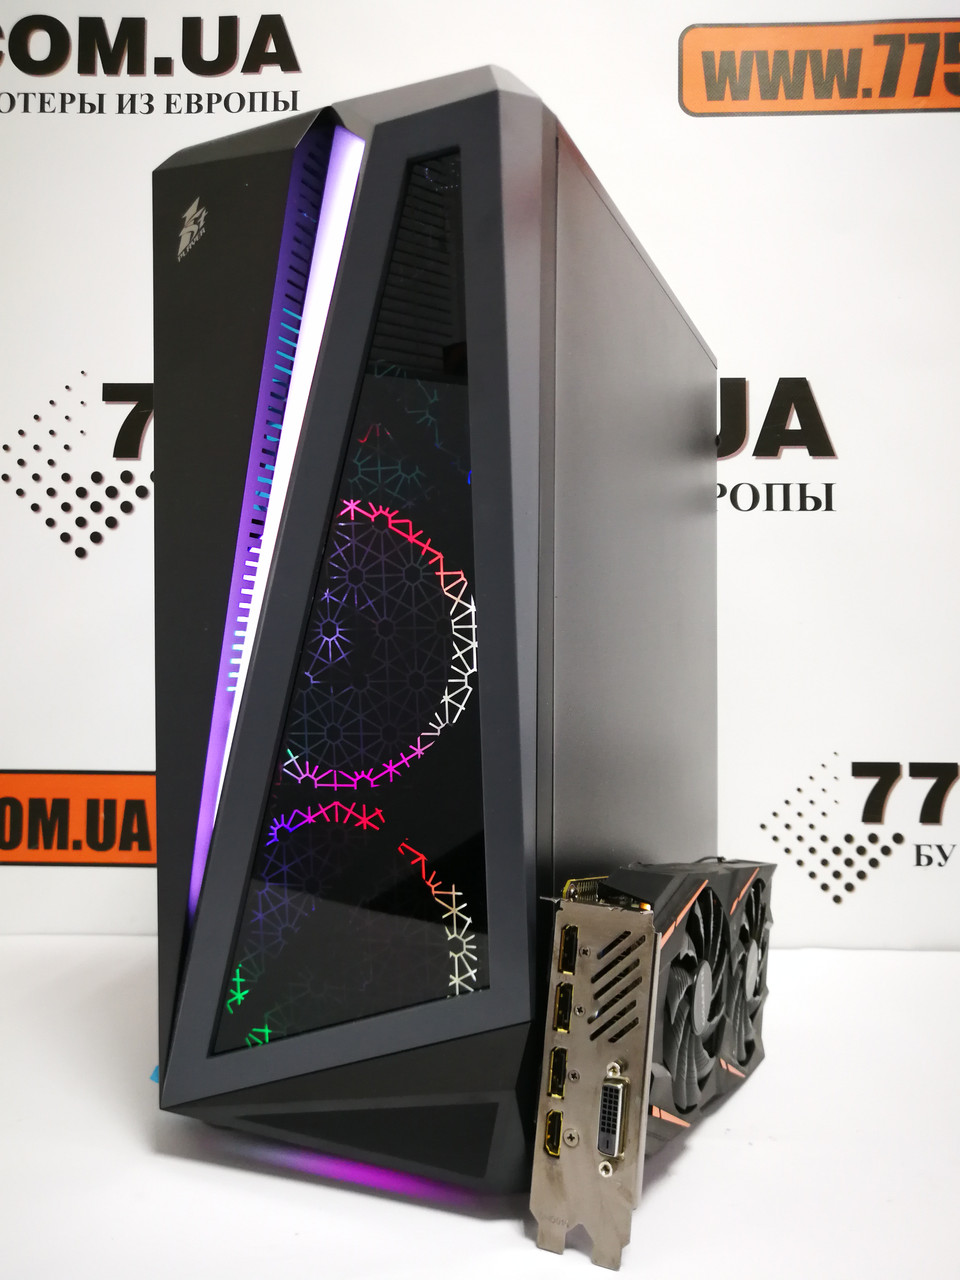 Игровой компьютер, AMD Ryzen 5 1600 3.60GHz (12 потоков), 16ГБ DDR4, SSD 240ГБ, HDD 1ТБ, GTX 1060 3ГБ